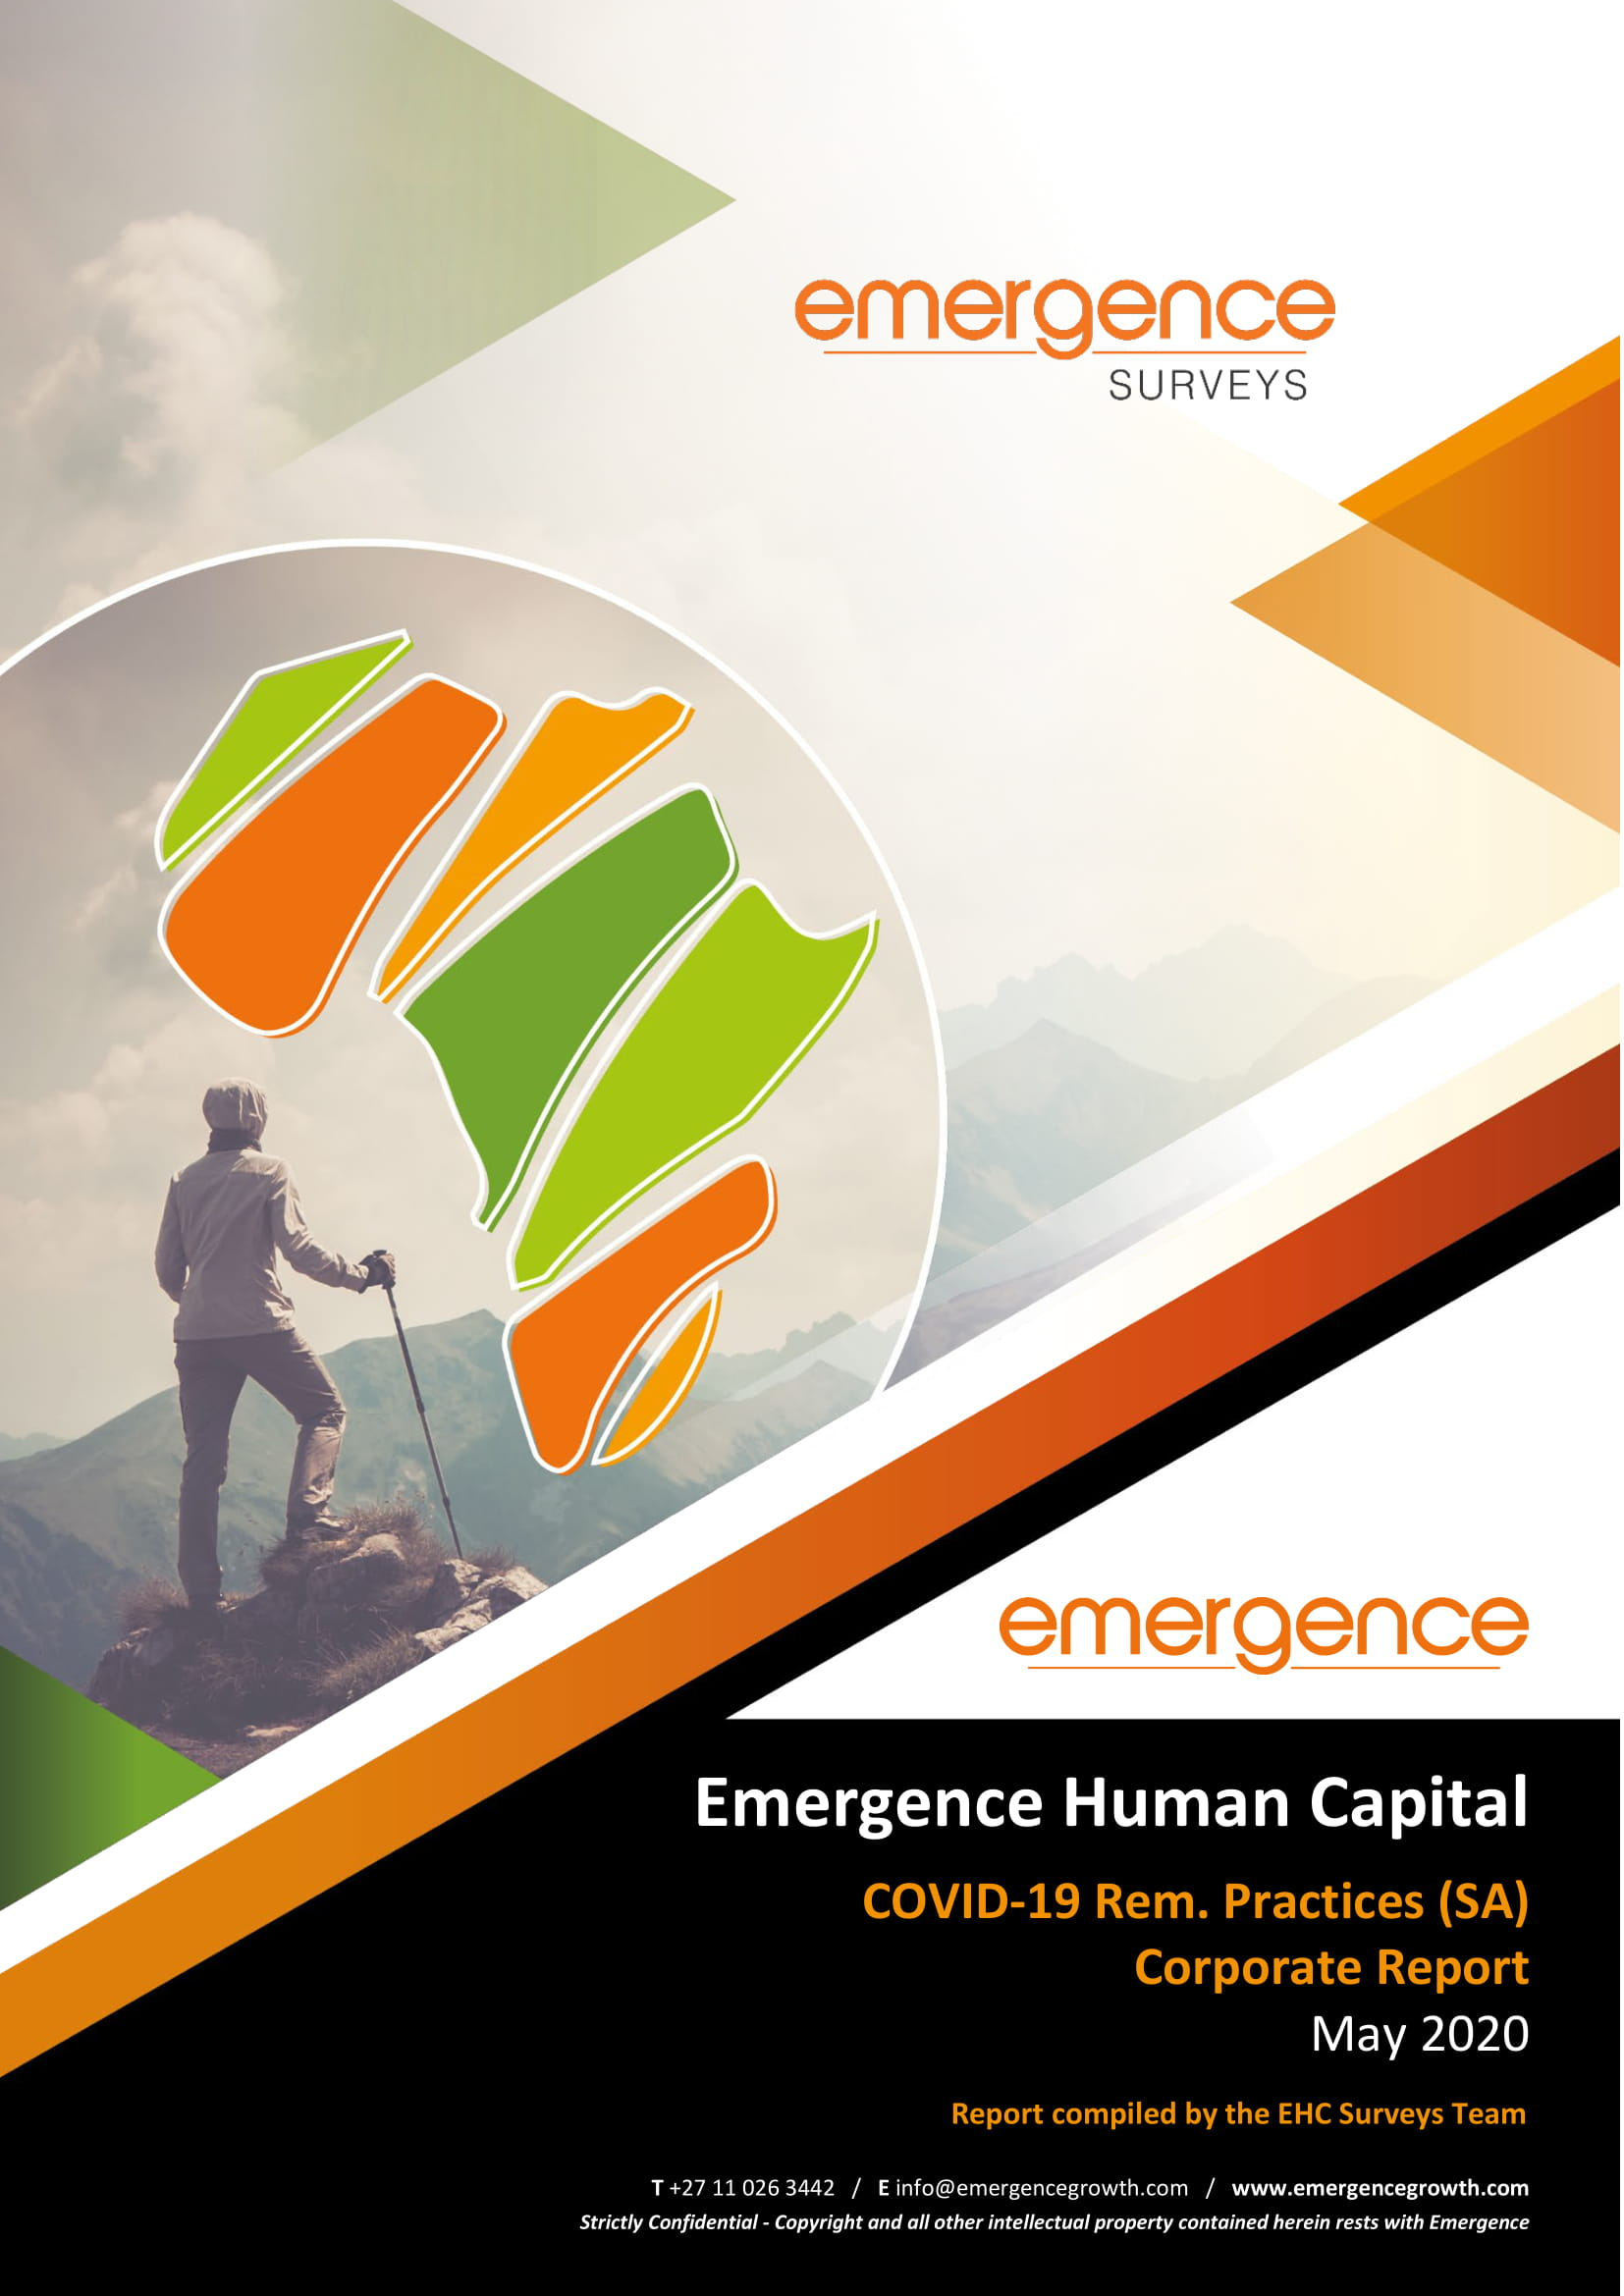 Emergence Human